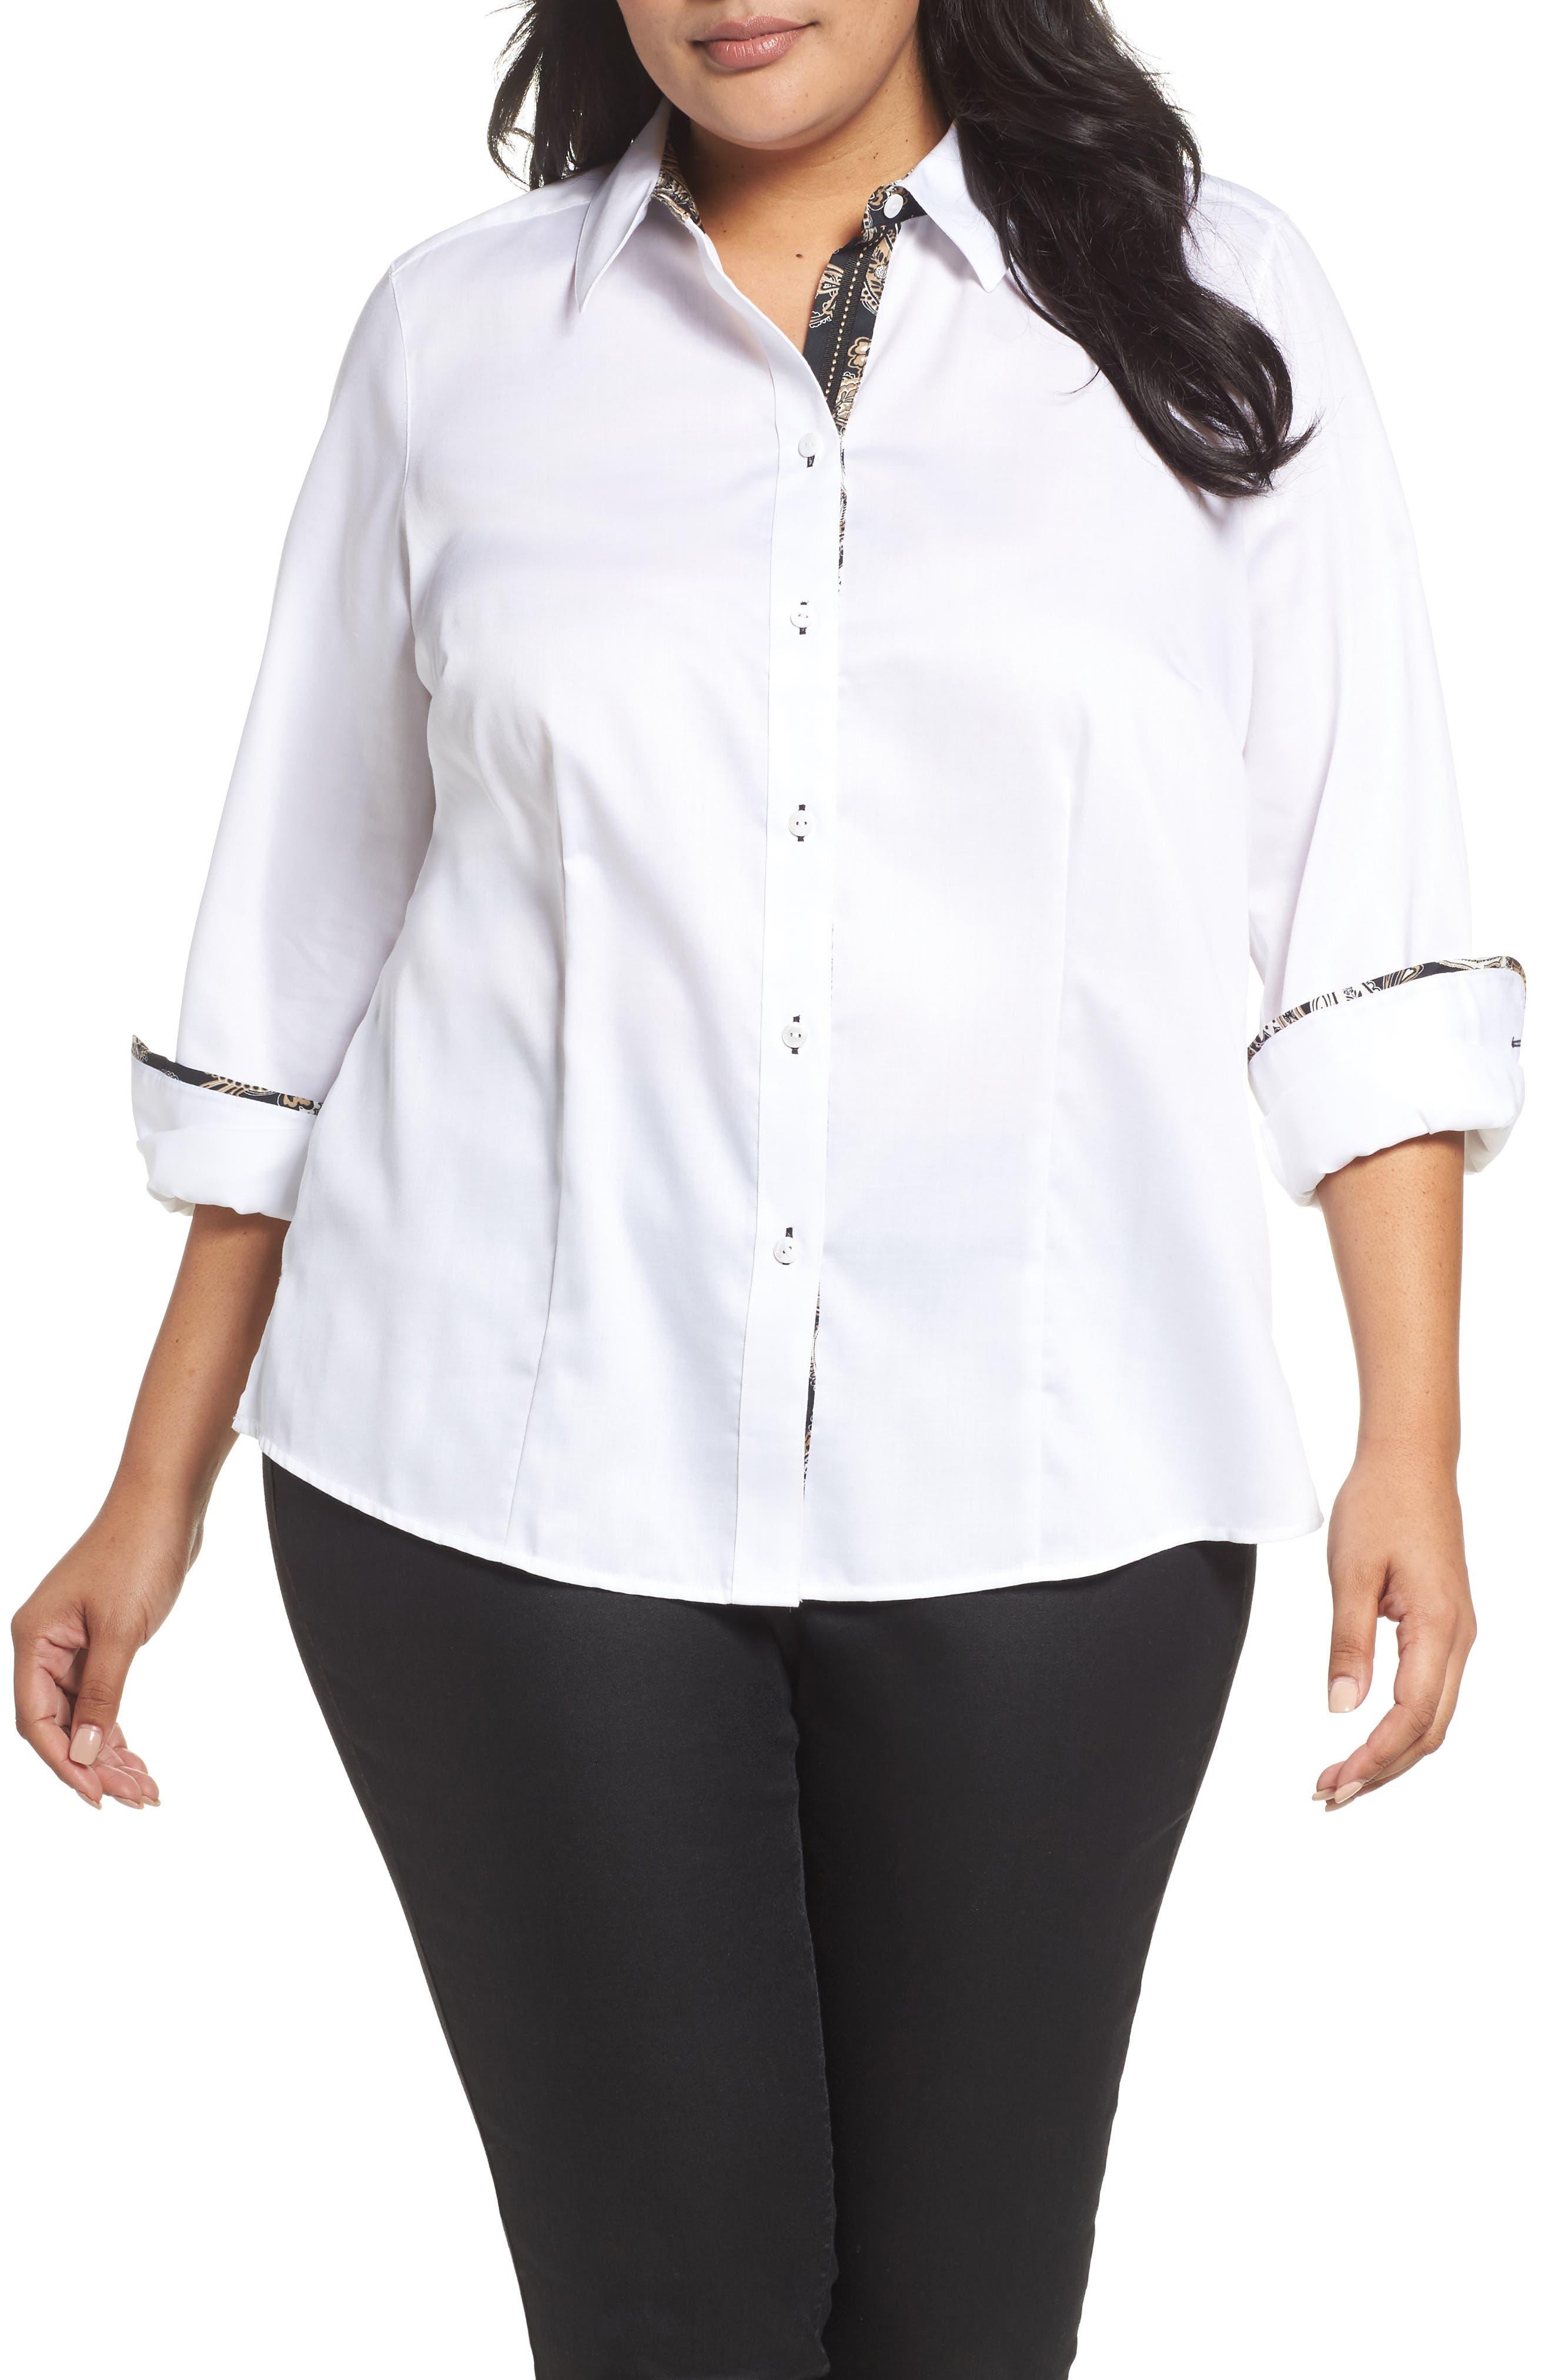 Main Image - Foxcroft Brooke Contrast Trim Sateen Shirt (Plus Size)